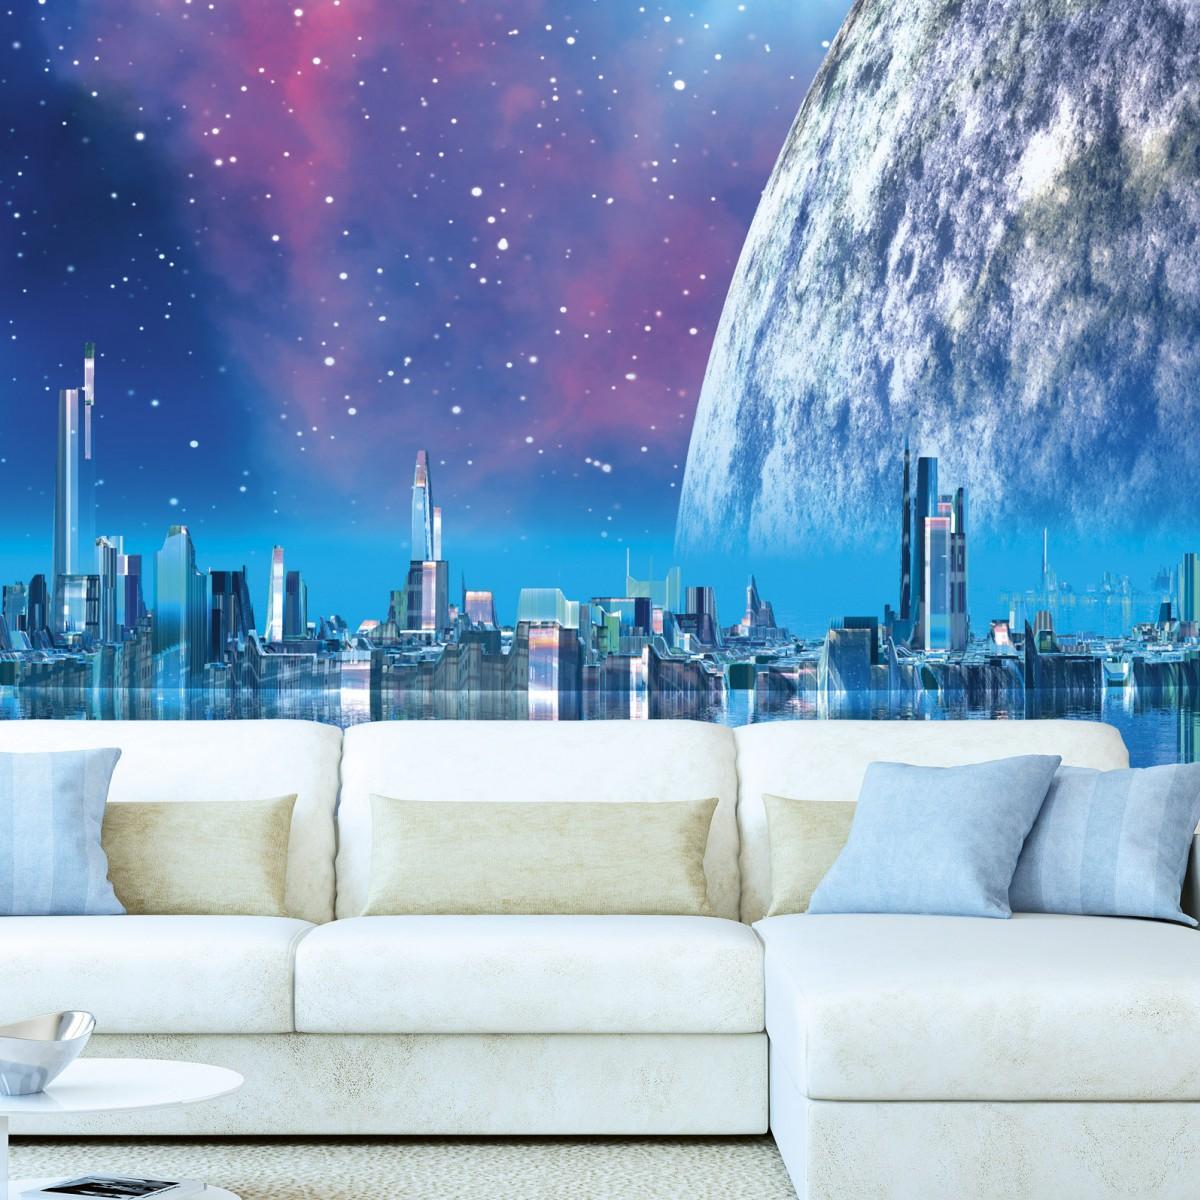 Foto tapet 3D Futuristic City, Dimex, 5 fâșii, 375 x 250cm